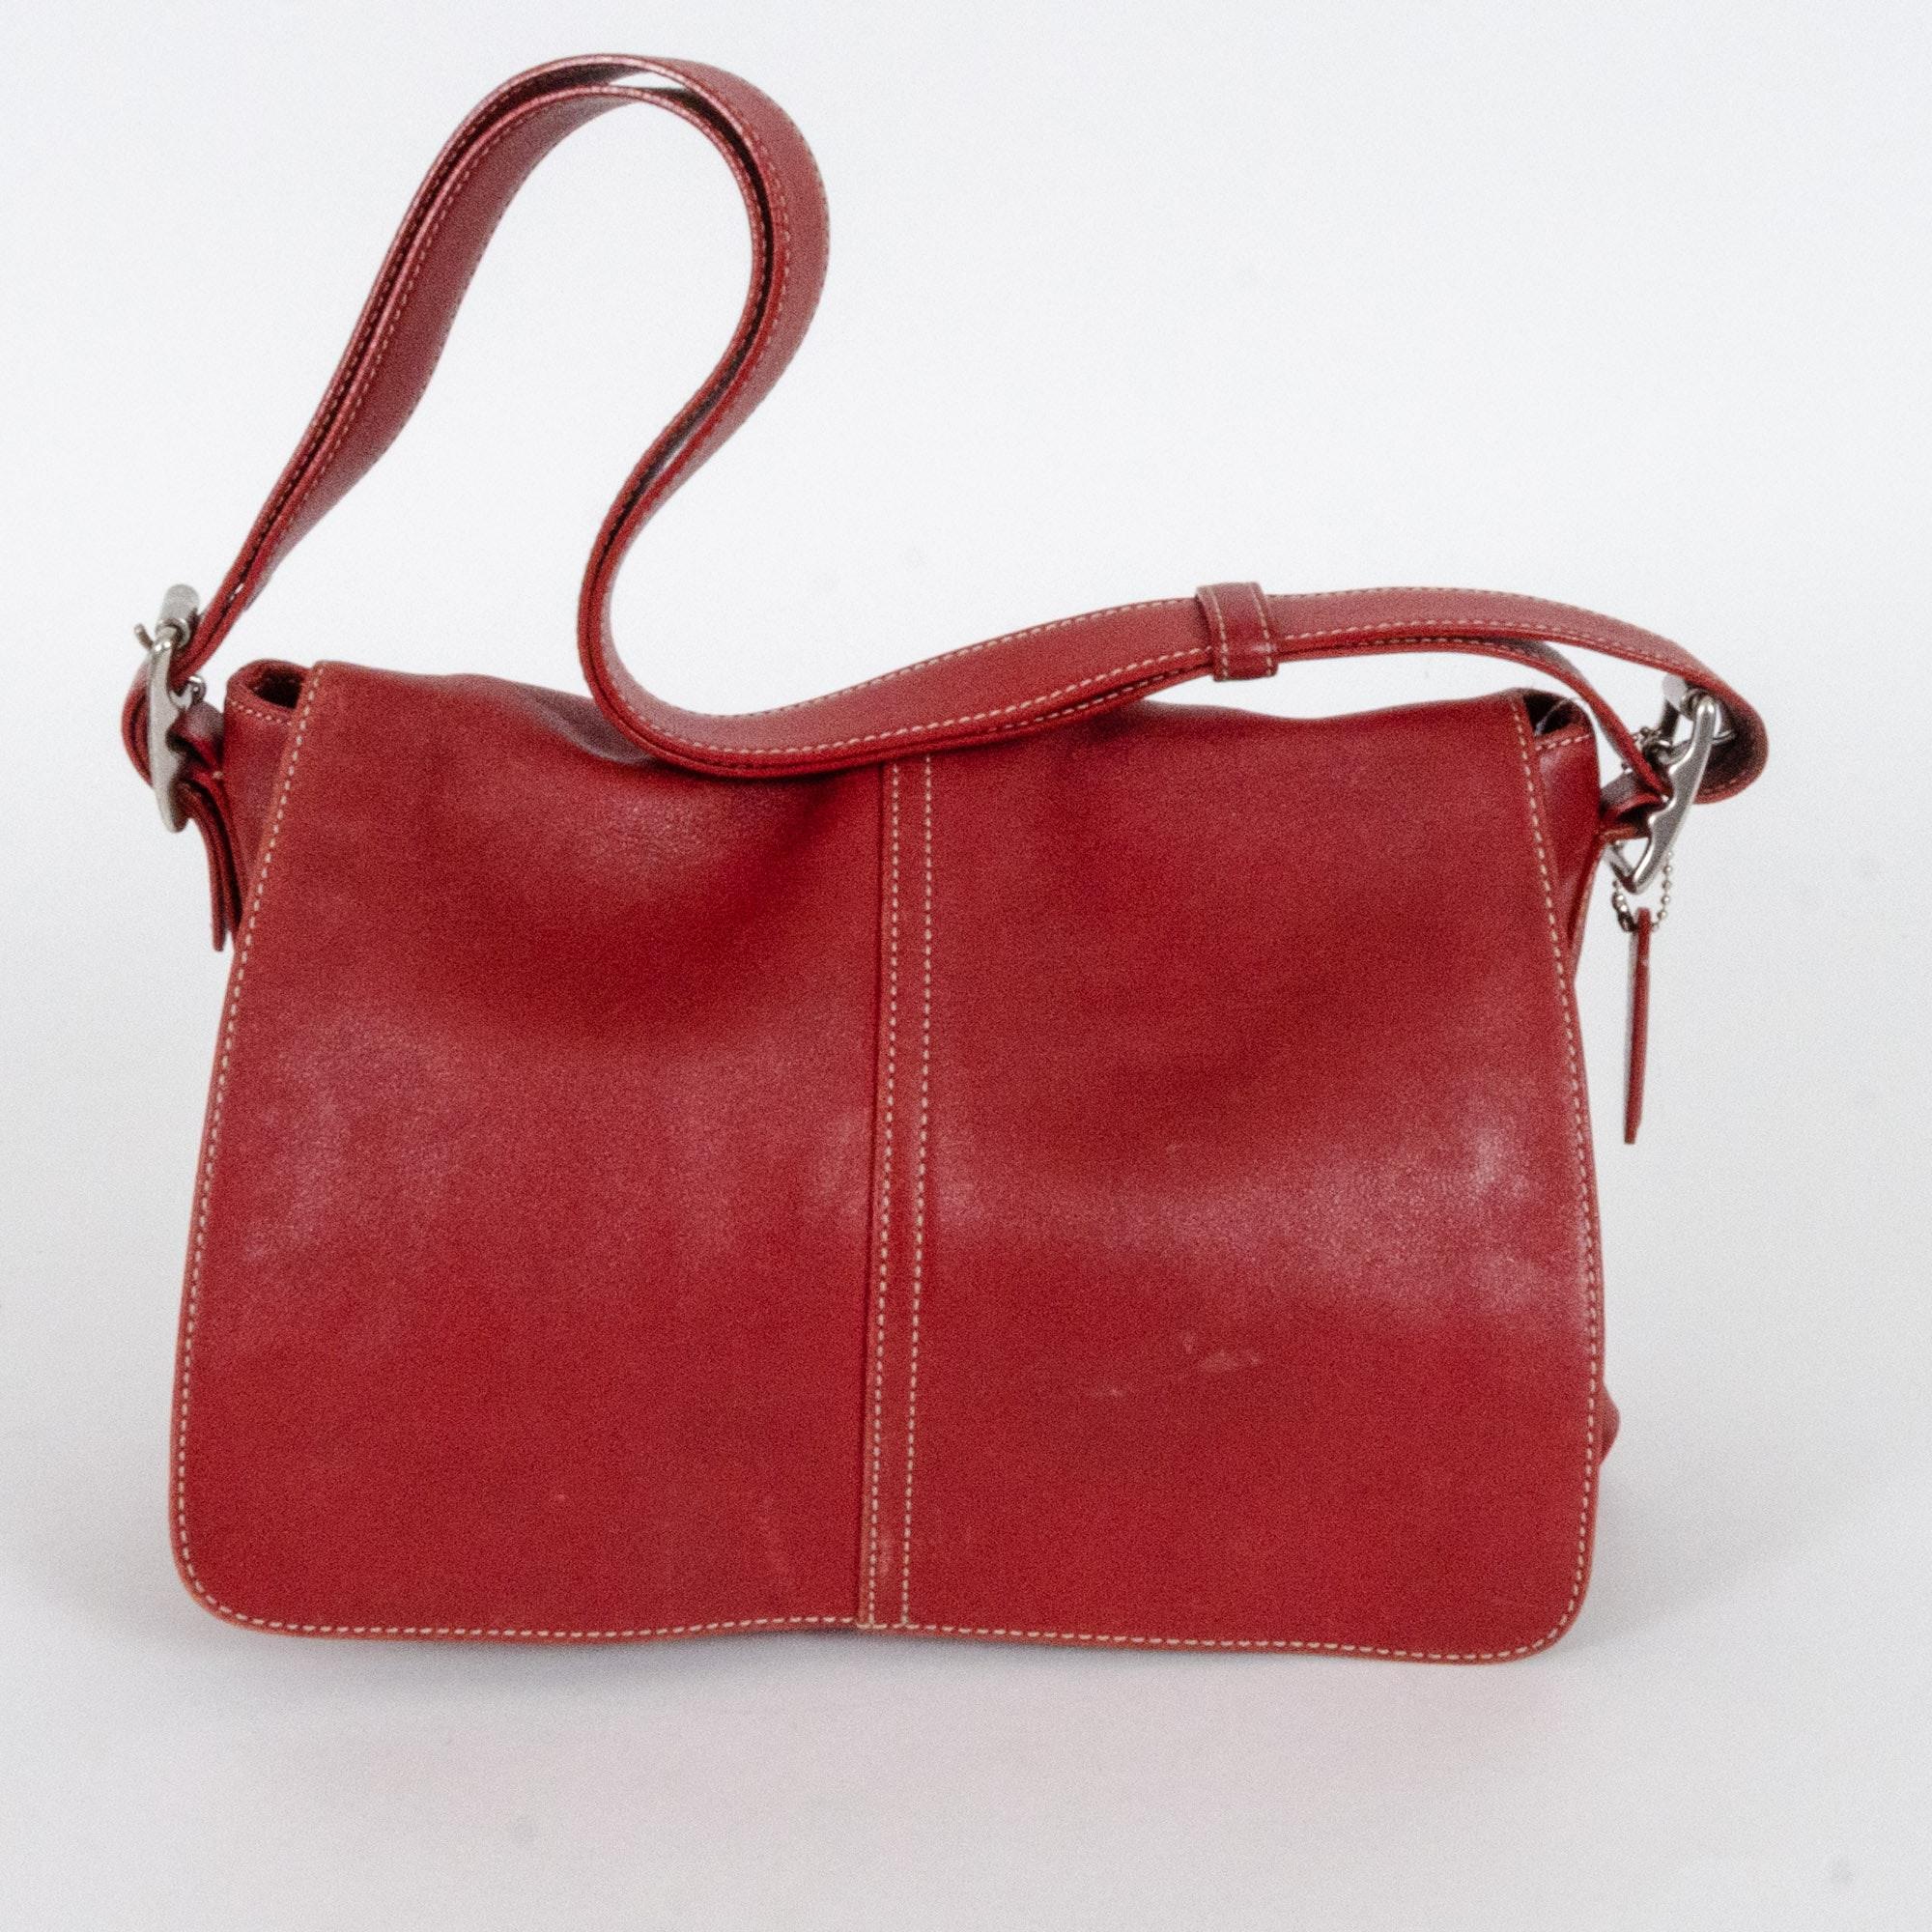 Vintage Coach Hamptons Flap Red Leather Handbag